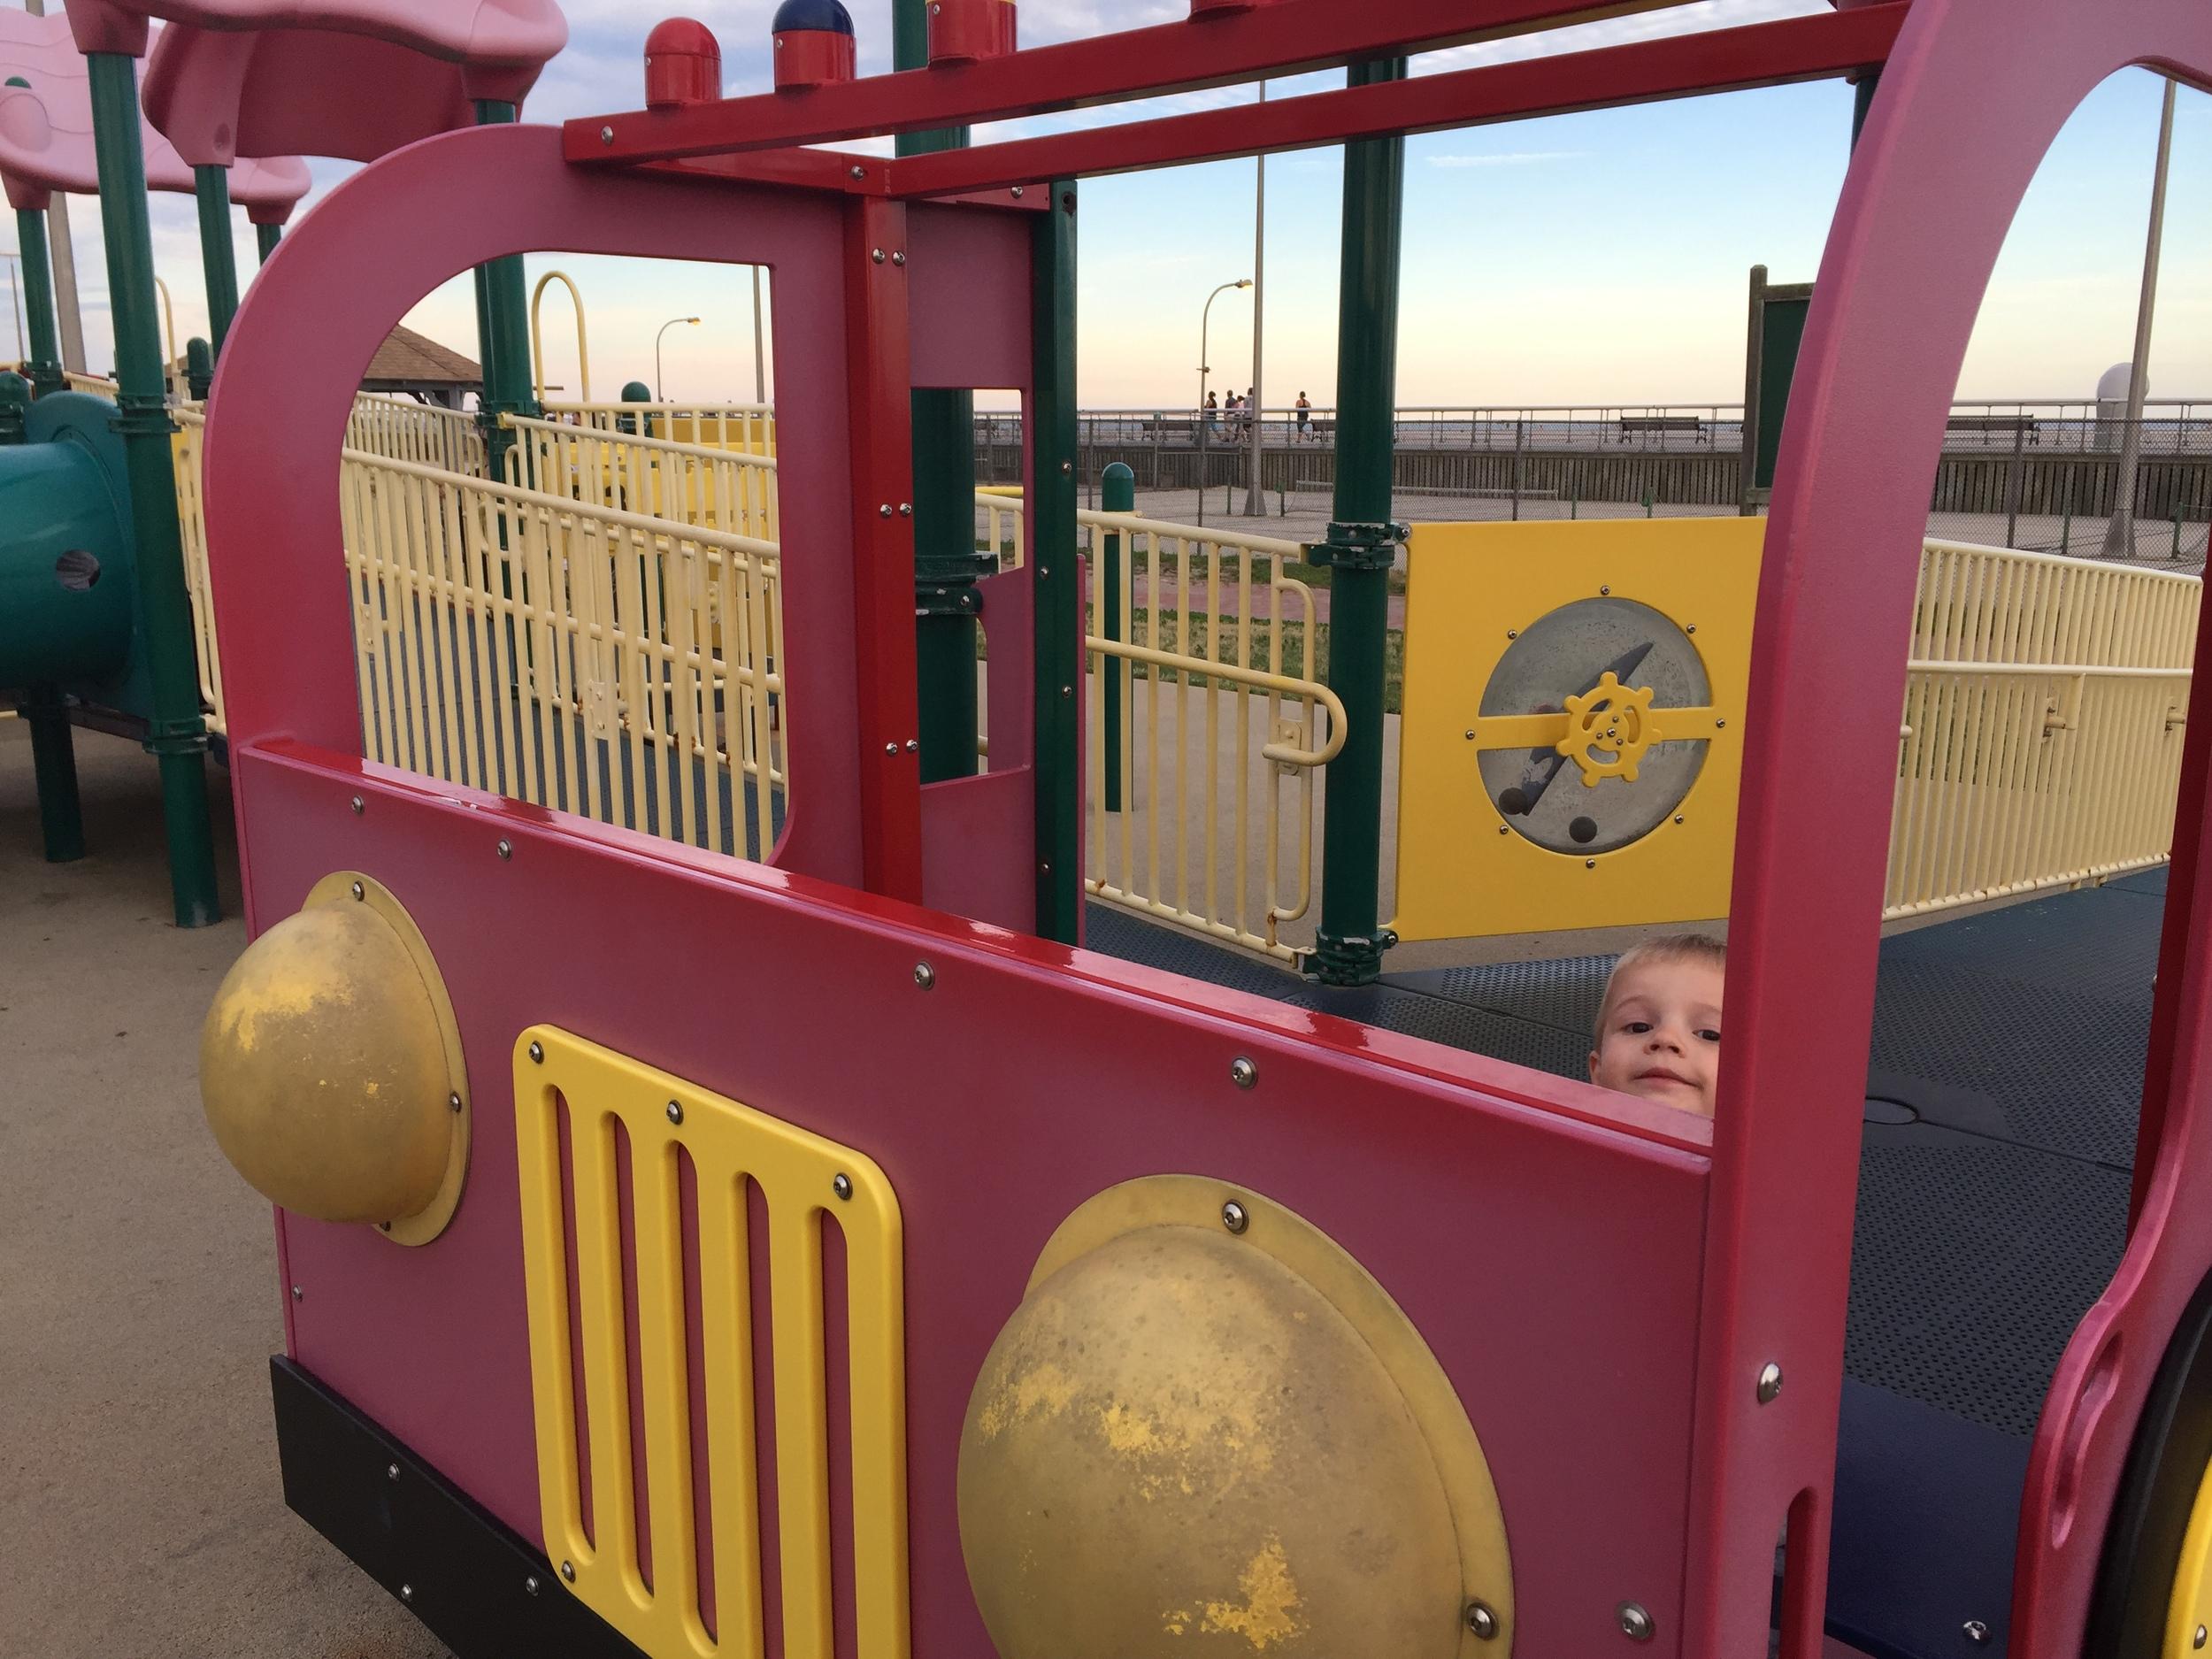 Play truck at Boardwalk Playground at Jones Beach